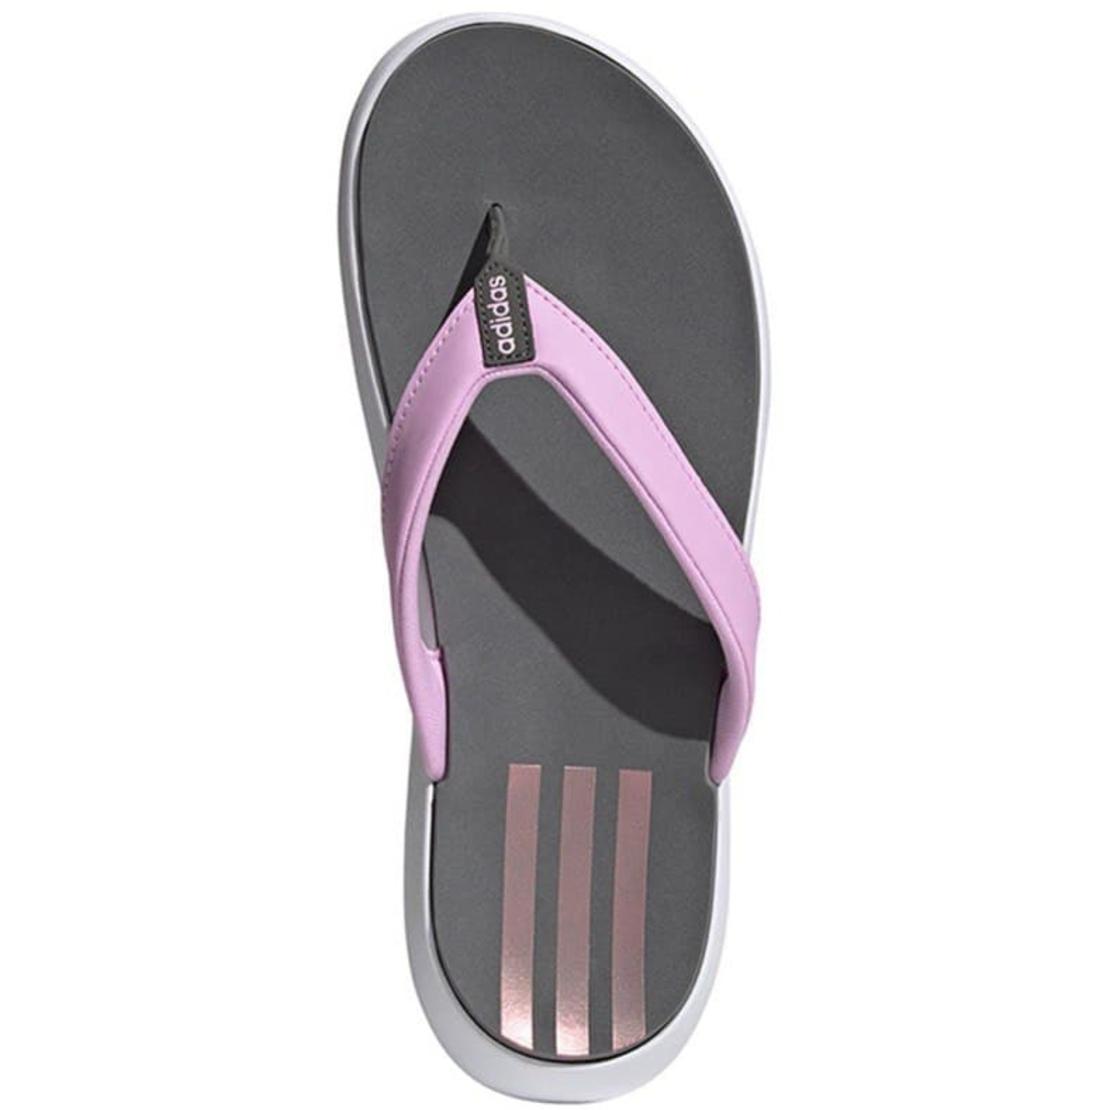 כפכף אדידס נשים | Adidas Comfort Flip Flop